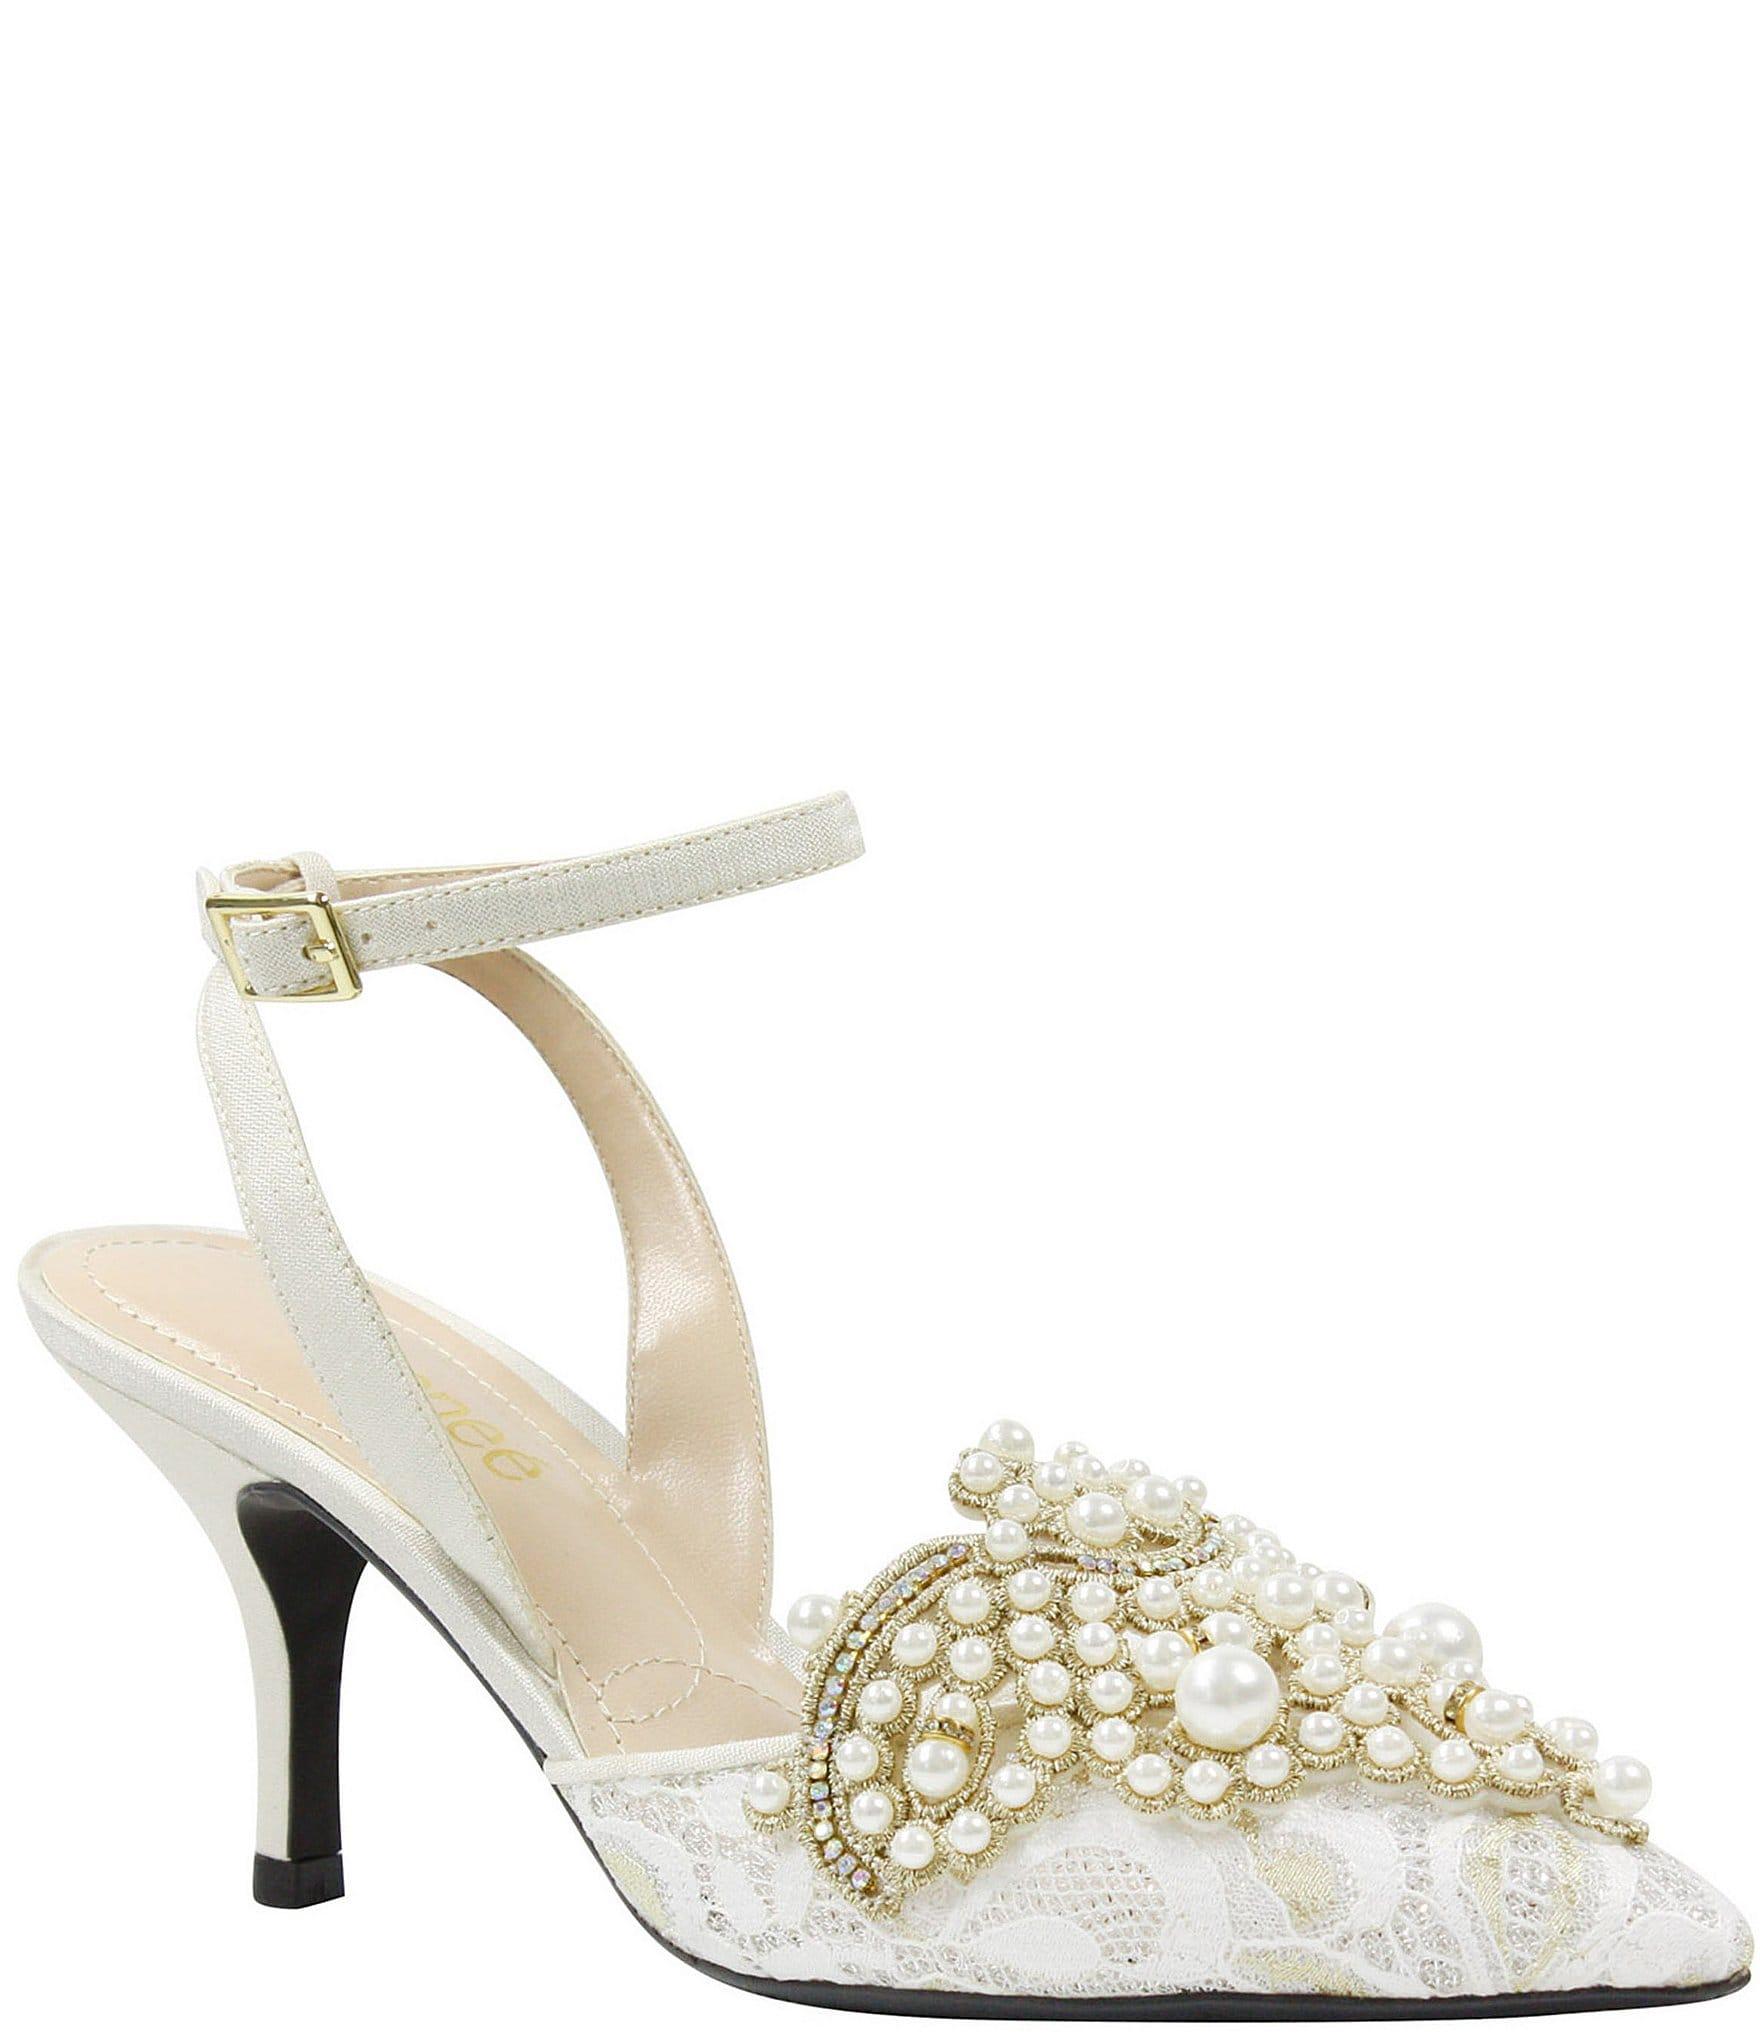 J. Renee Delishia Floral Embroidery Block Heel Sandals aotxE